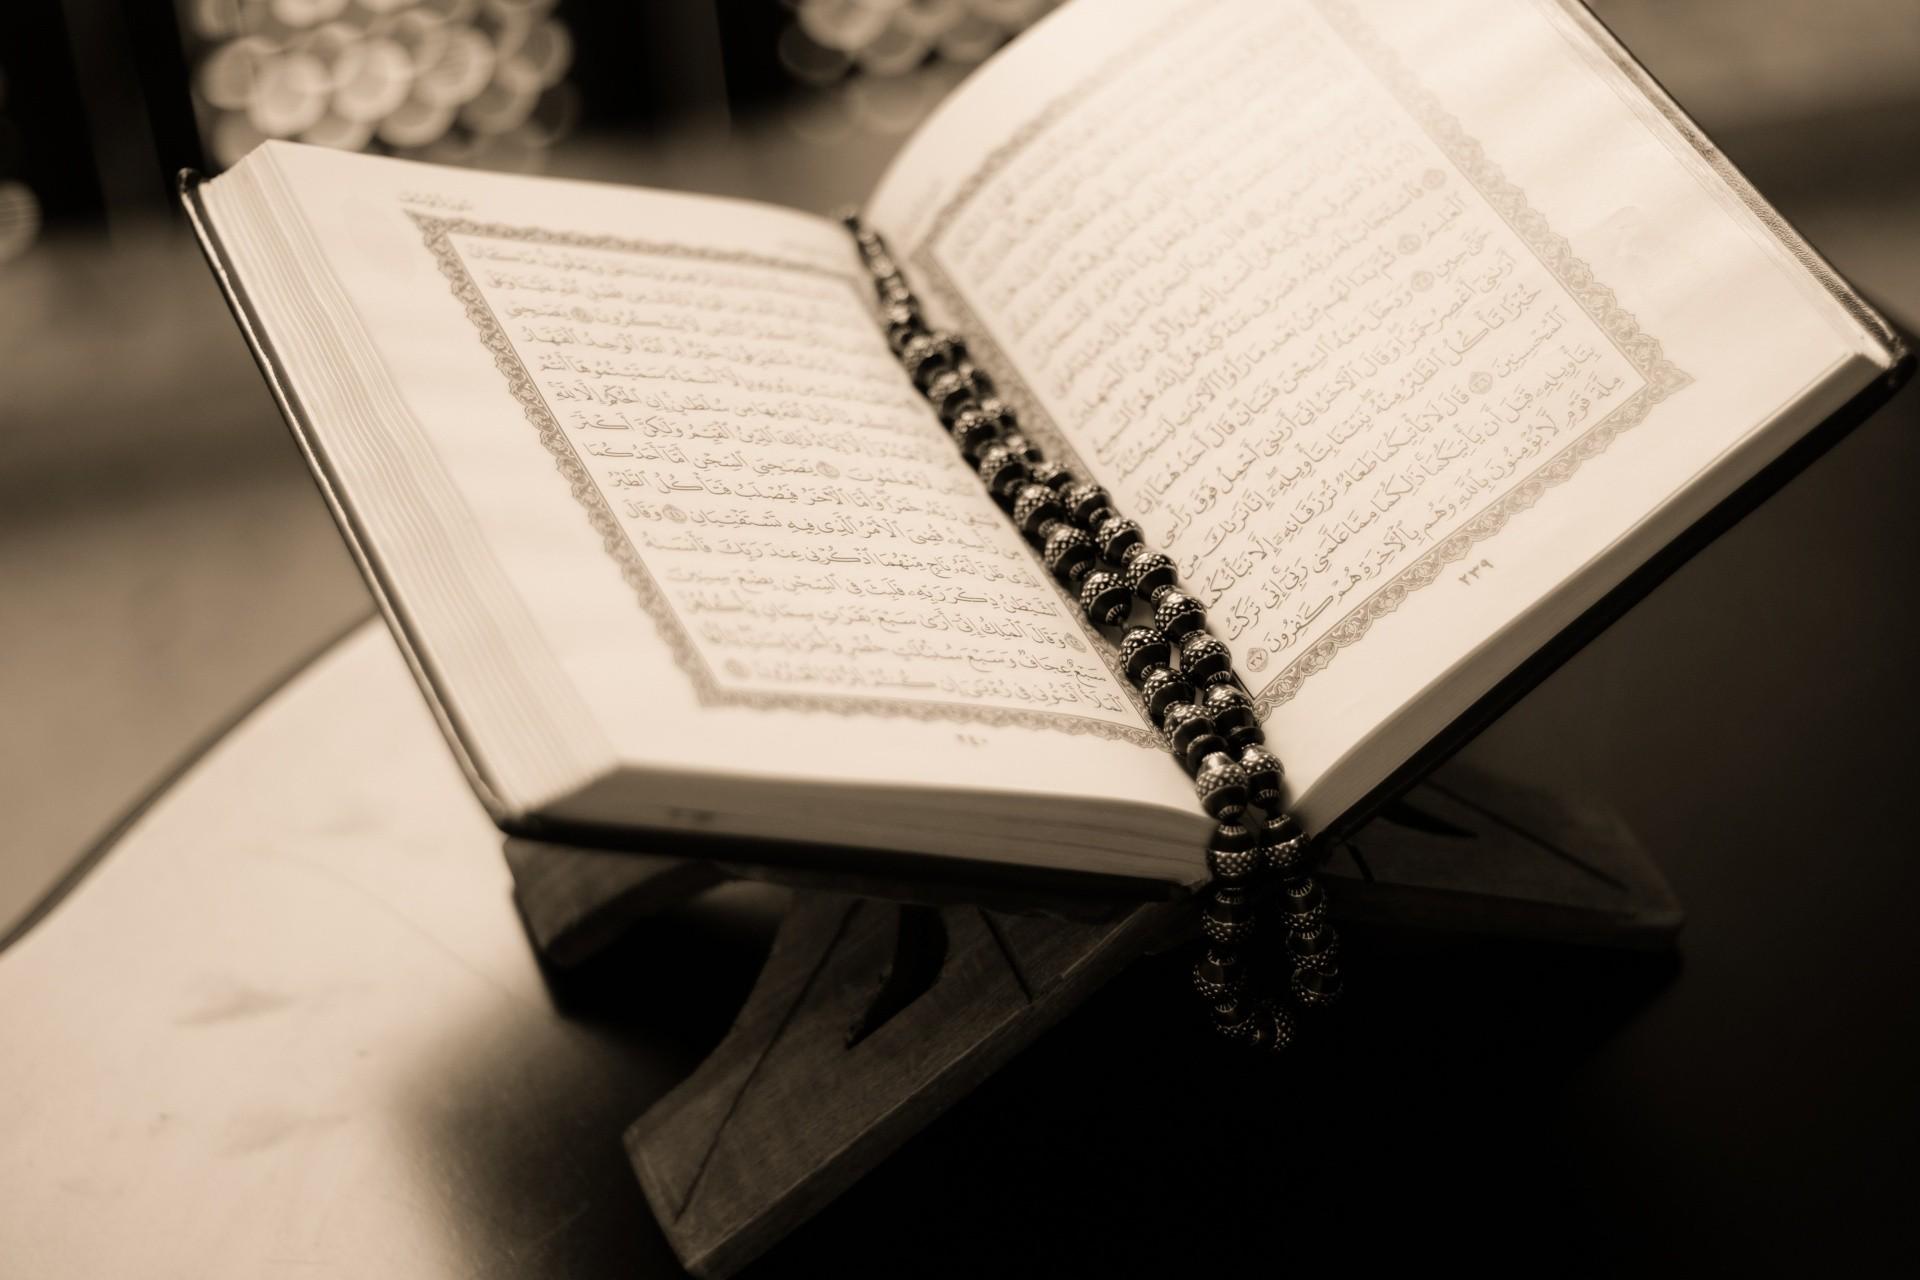 Reflections on Surah al-Wāqiʿah